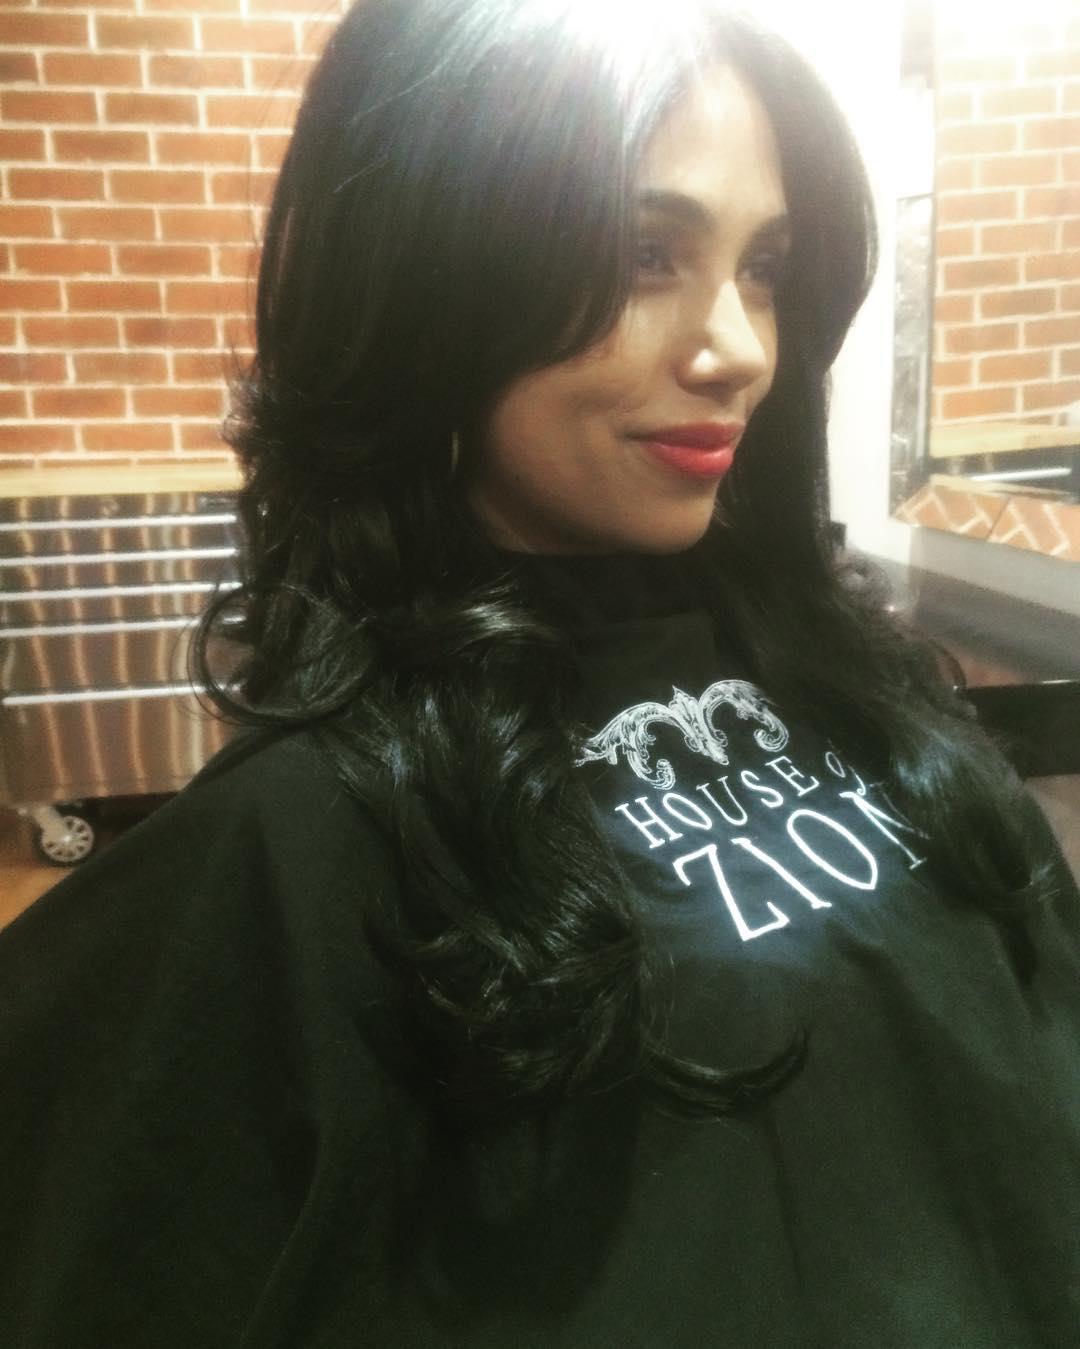 curled dark hair